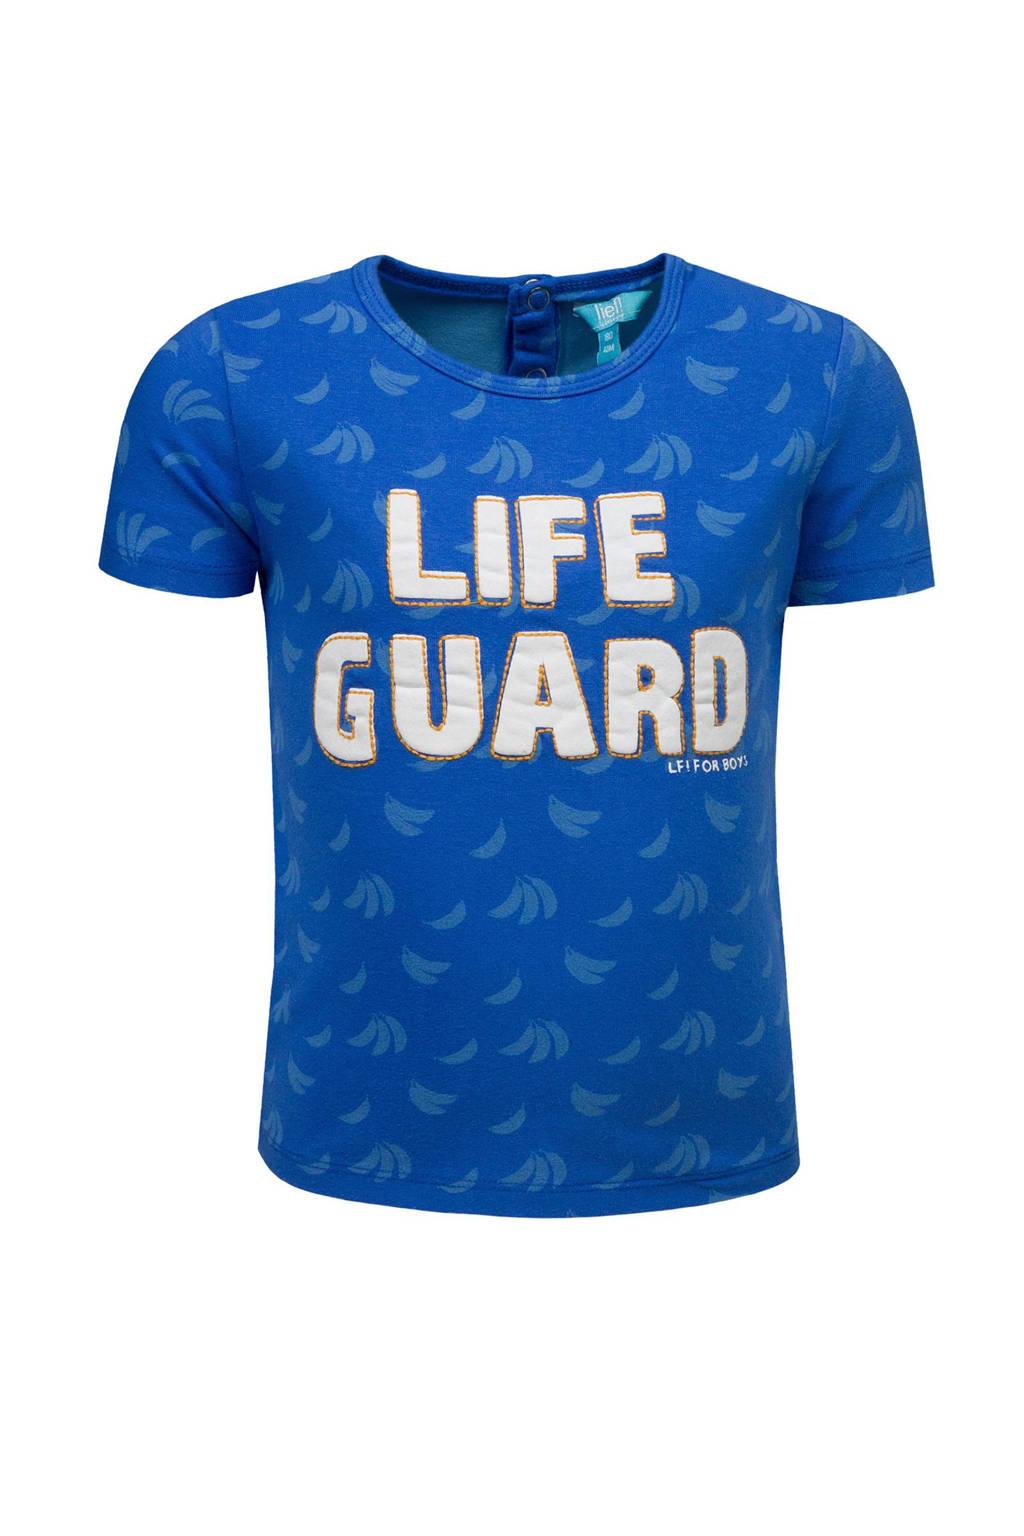 lief! T-shirt met tekst blauw, Blauw/wit